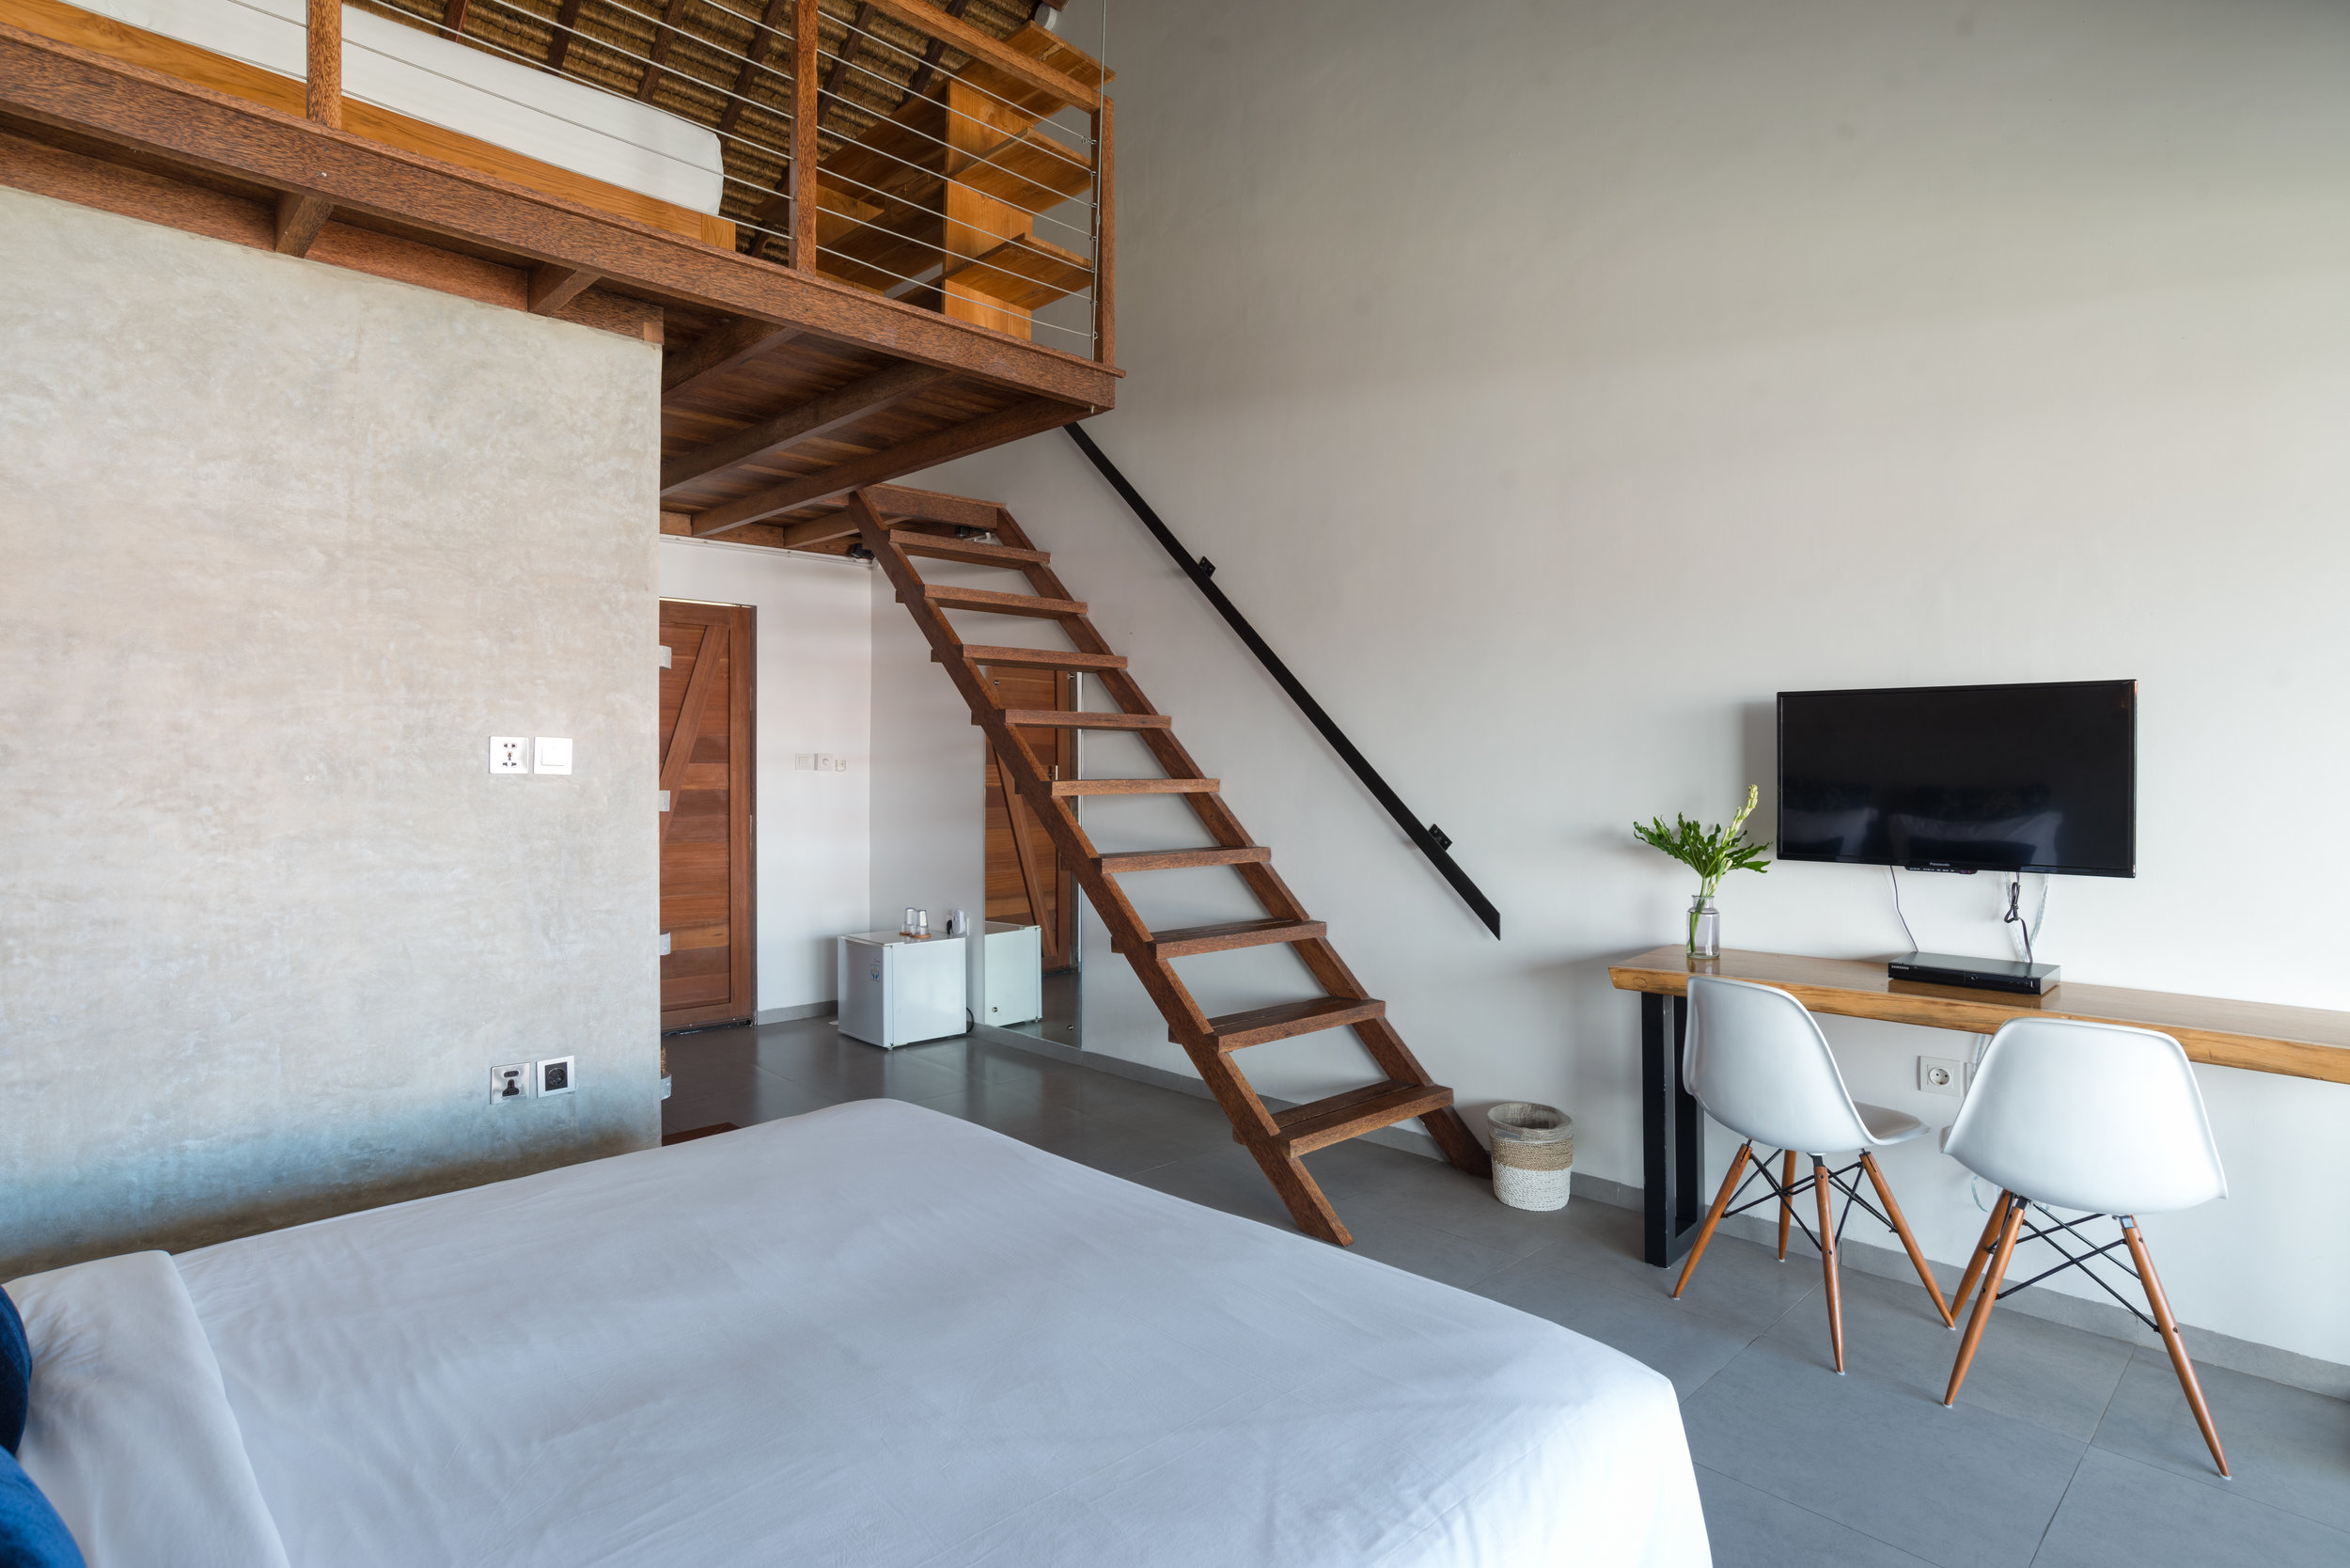 Bedroom-8465.jpg